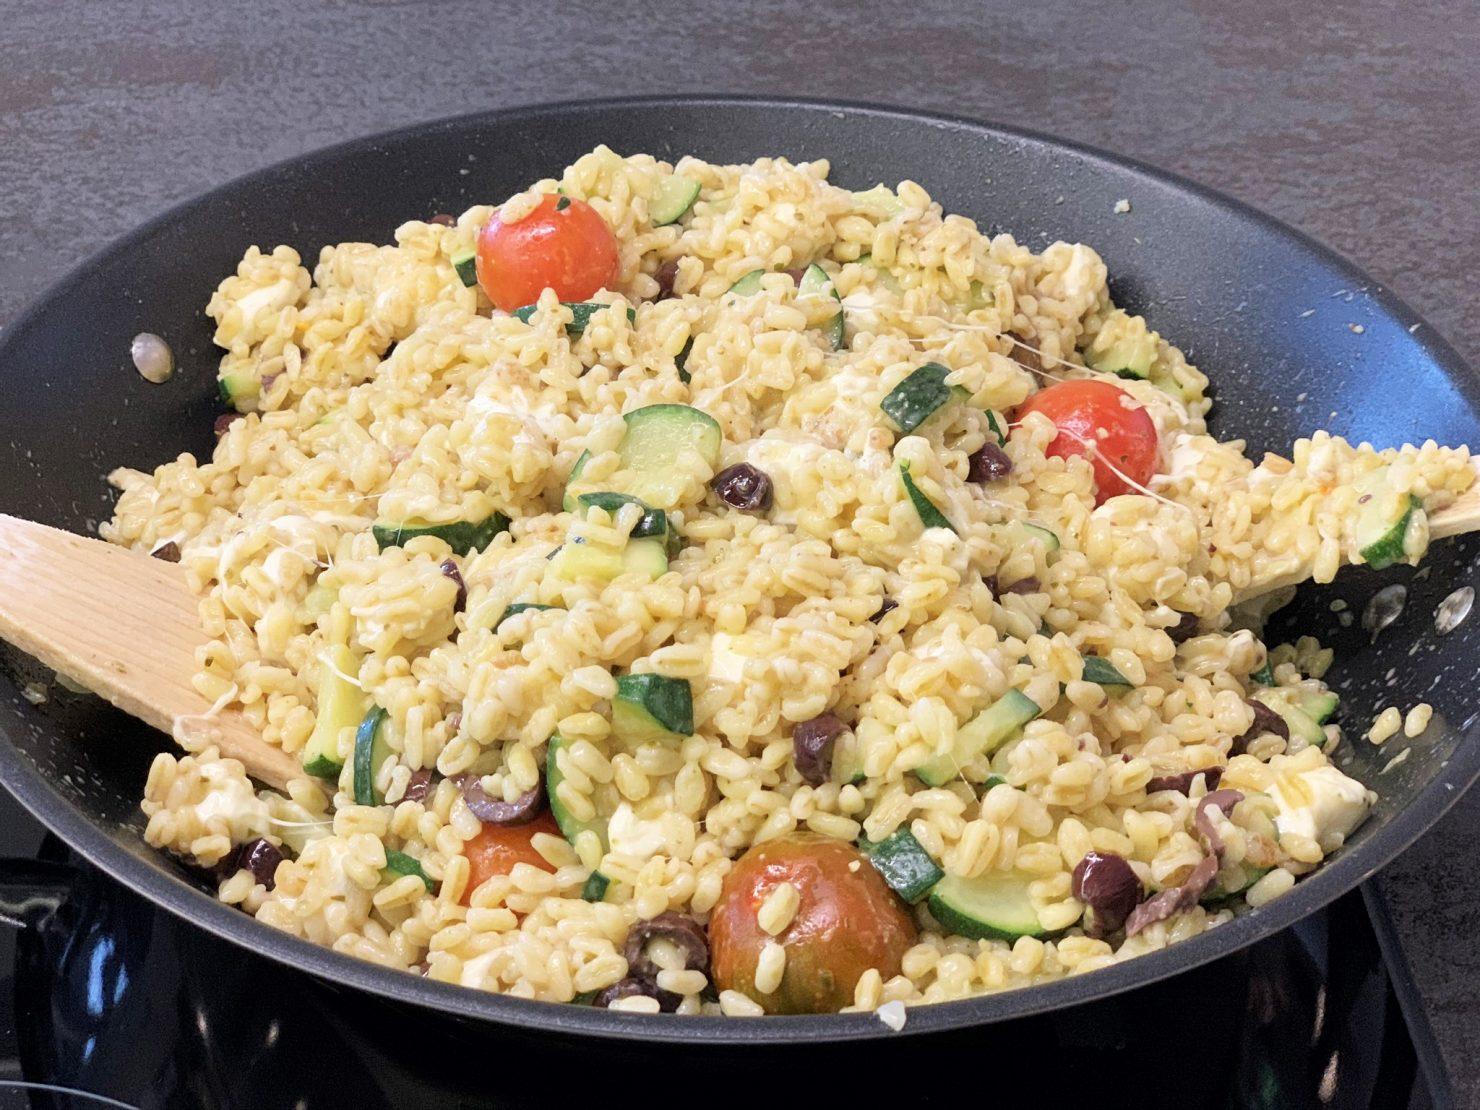 Ebly-Pfanne all'italiana mit Gemüse, Mozzarella und Pesto